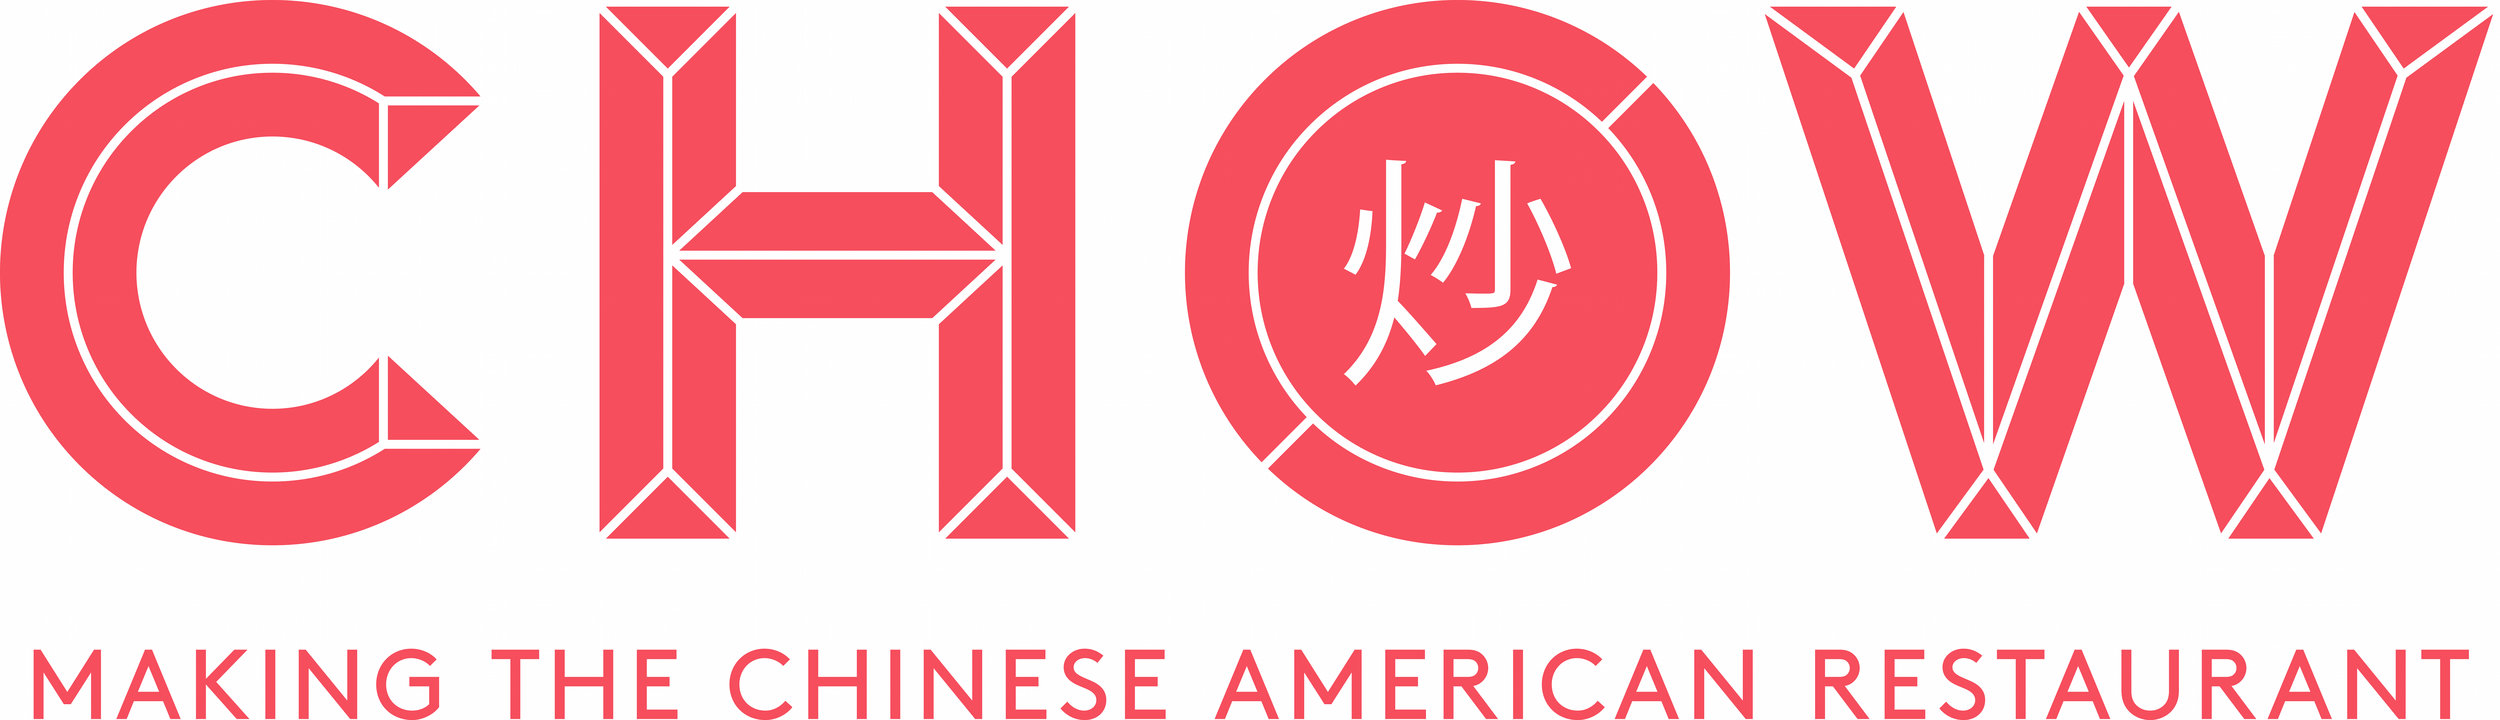 Chow Logo.jpg